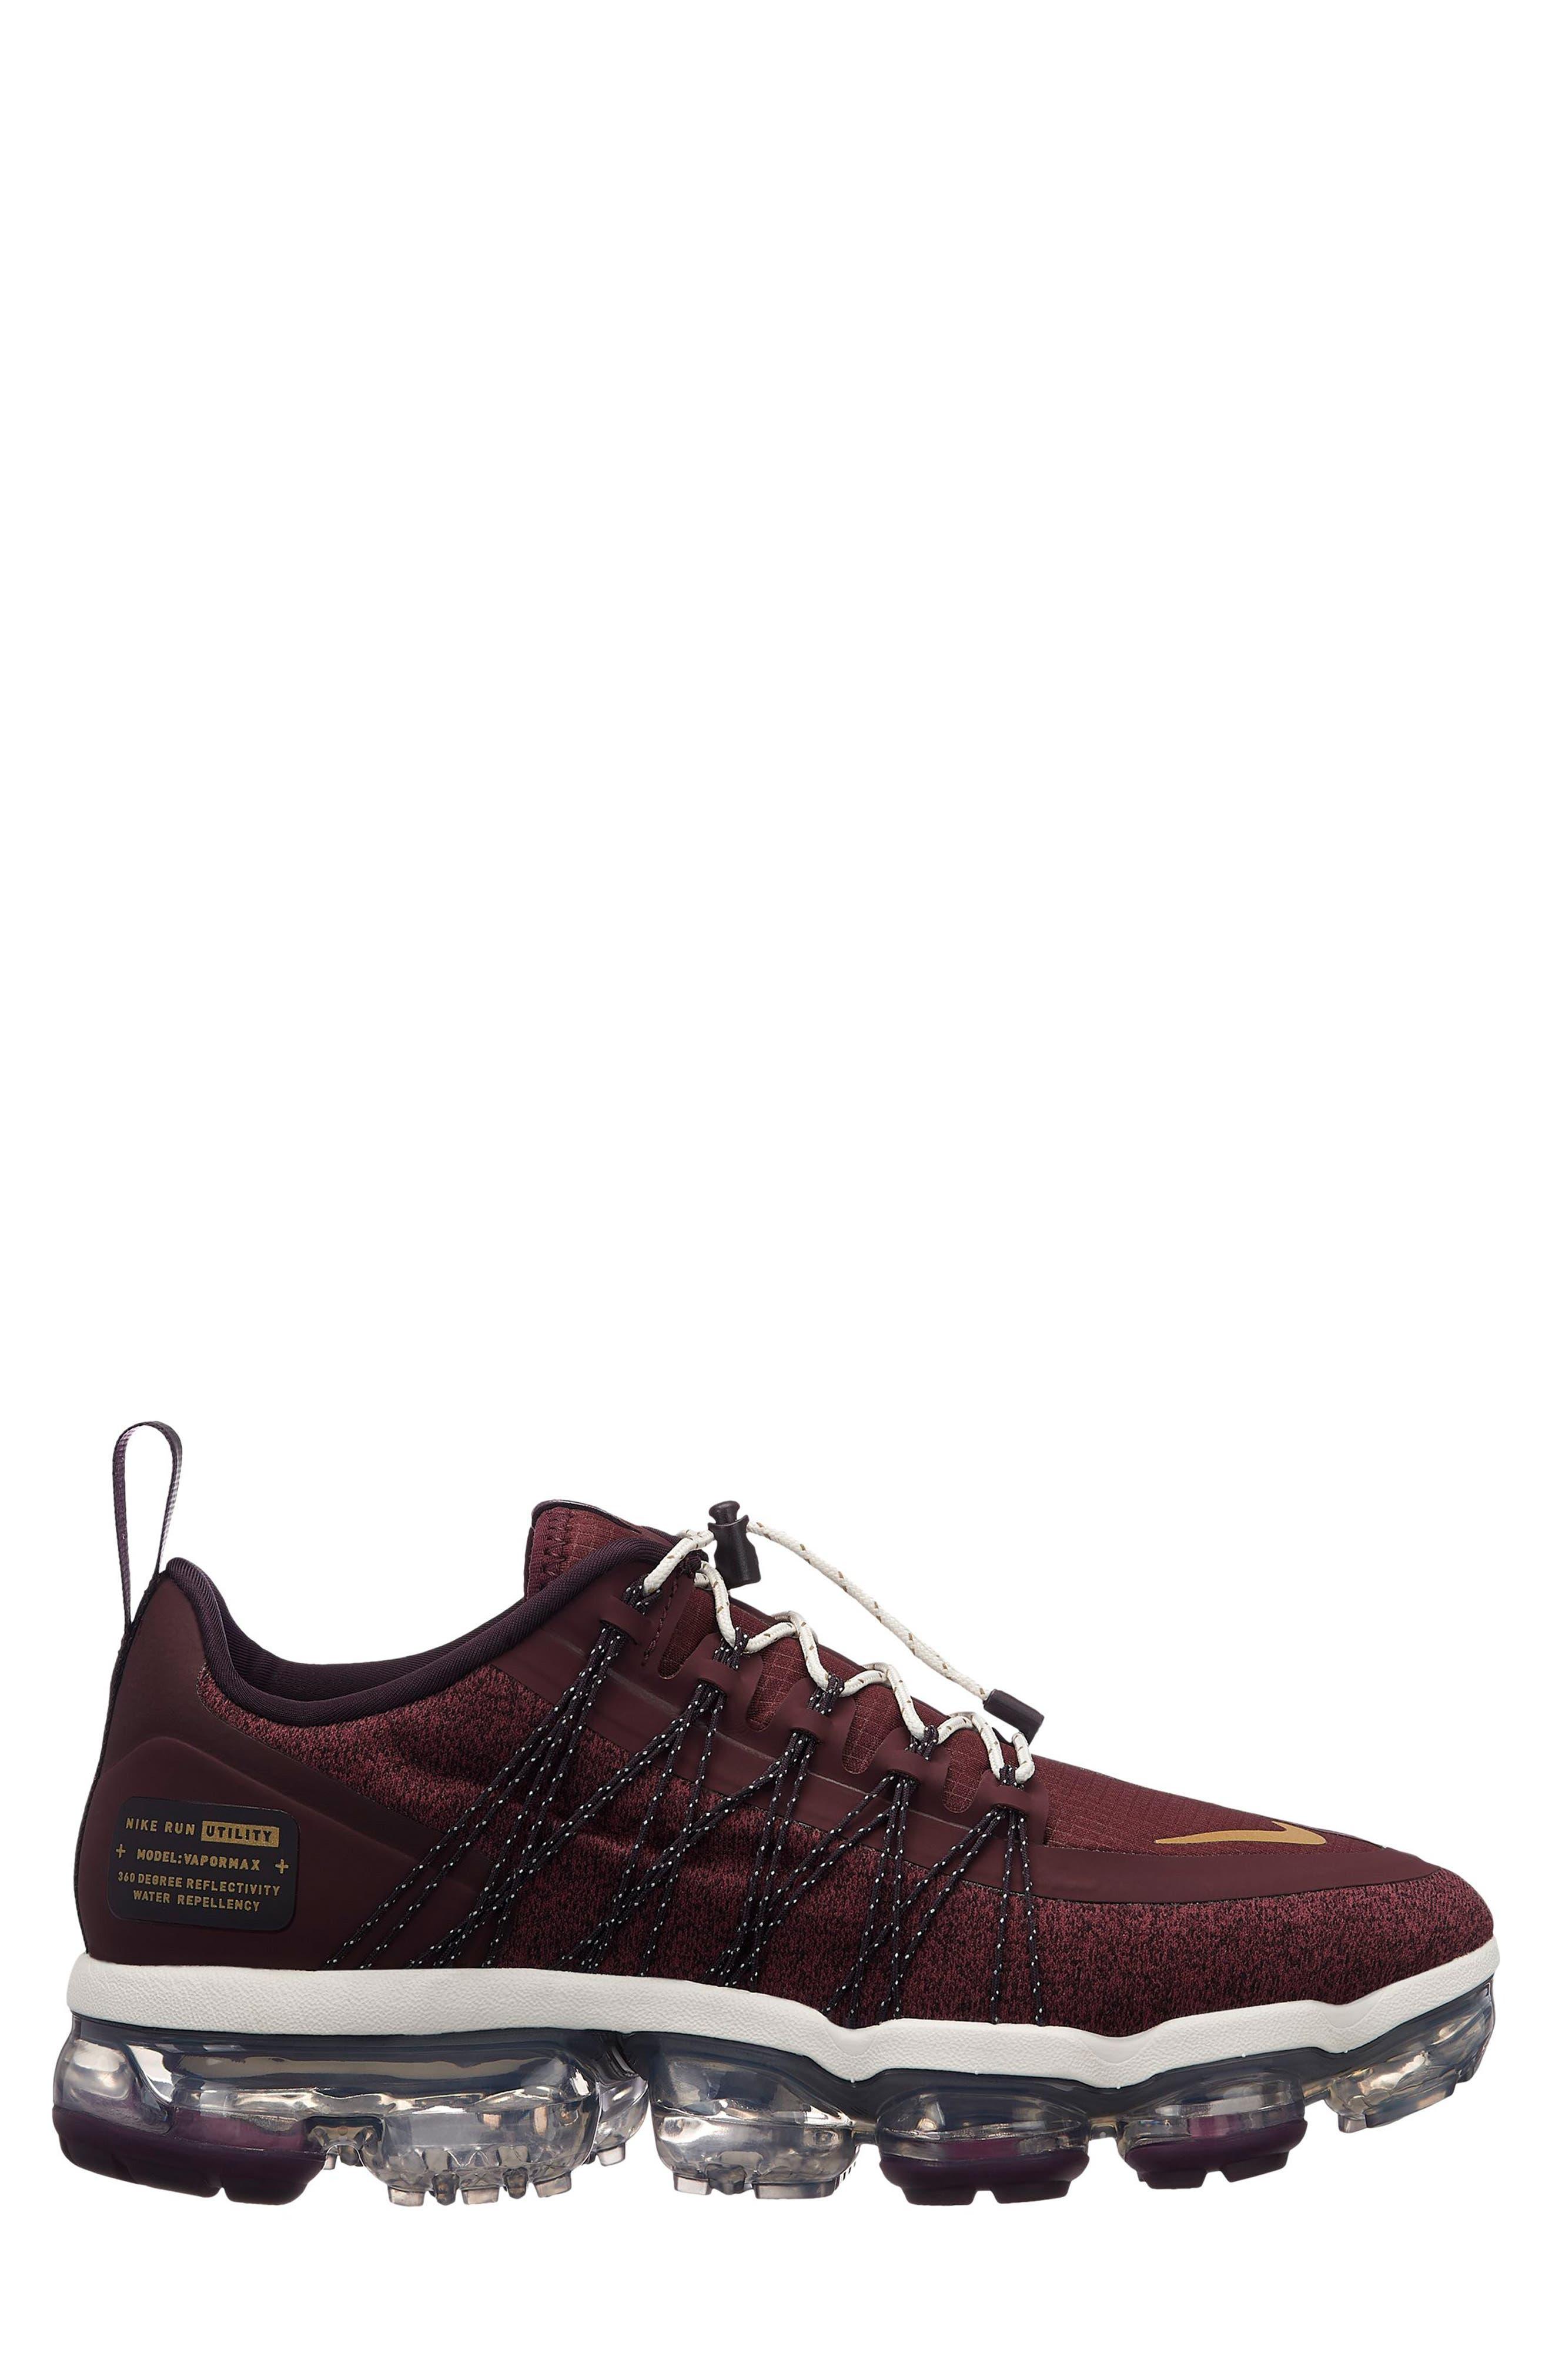 Air Vapormax Run Utility Sneaker,                             Main thumbnail 1, color,                             BURGUNDY CRUSH/ METALLIC GOLD